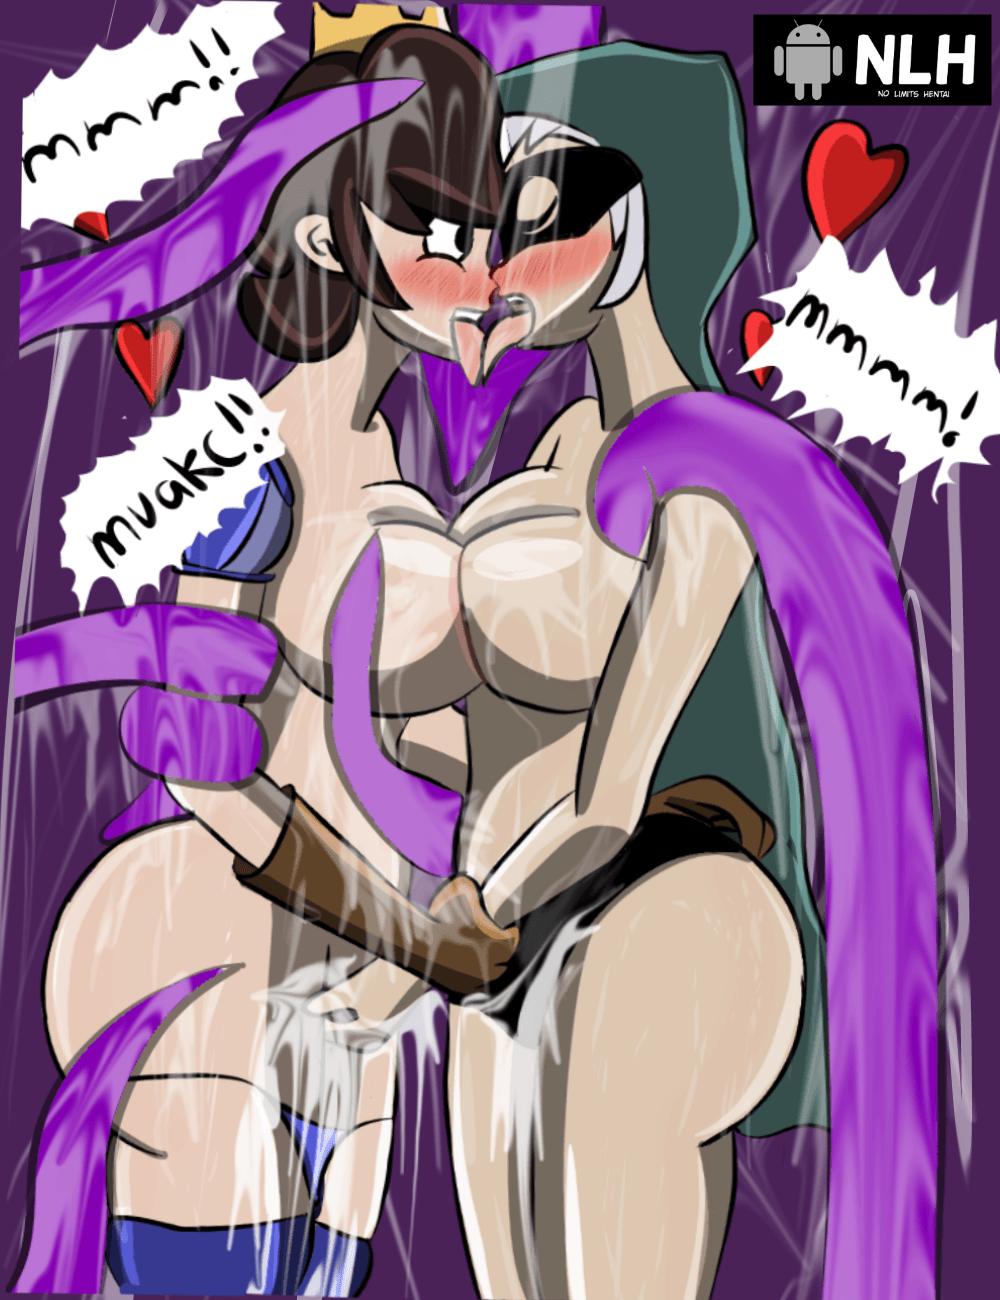 clash witch of sex clans Ero manga! h mo manga mo step-upd